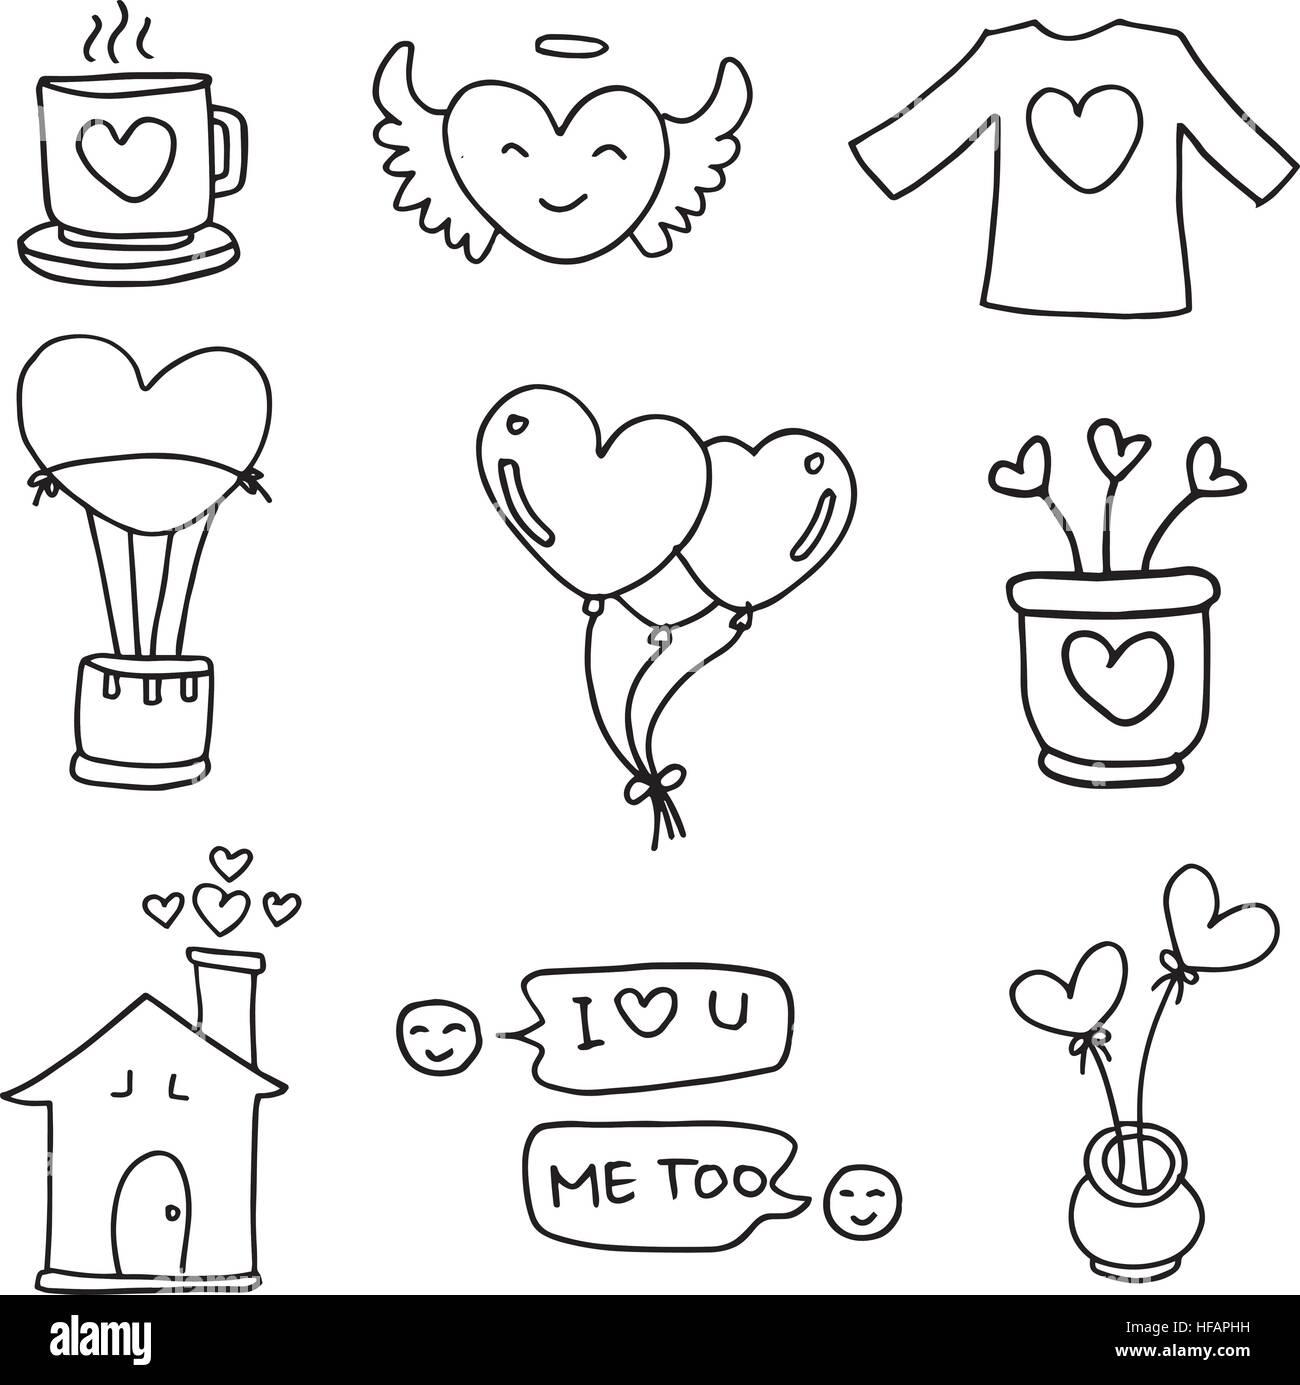 Illustration Of Hand Draw Love Doodles Stock Vector Art